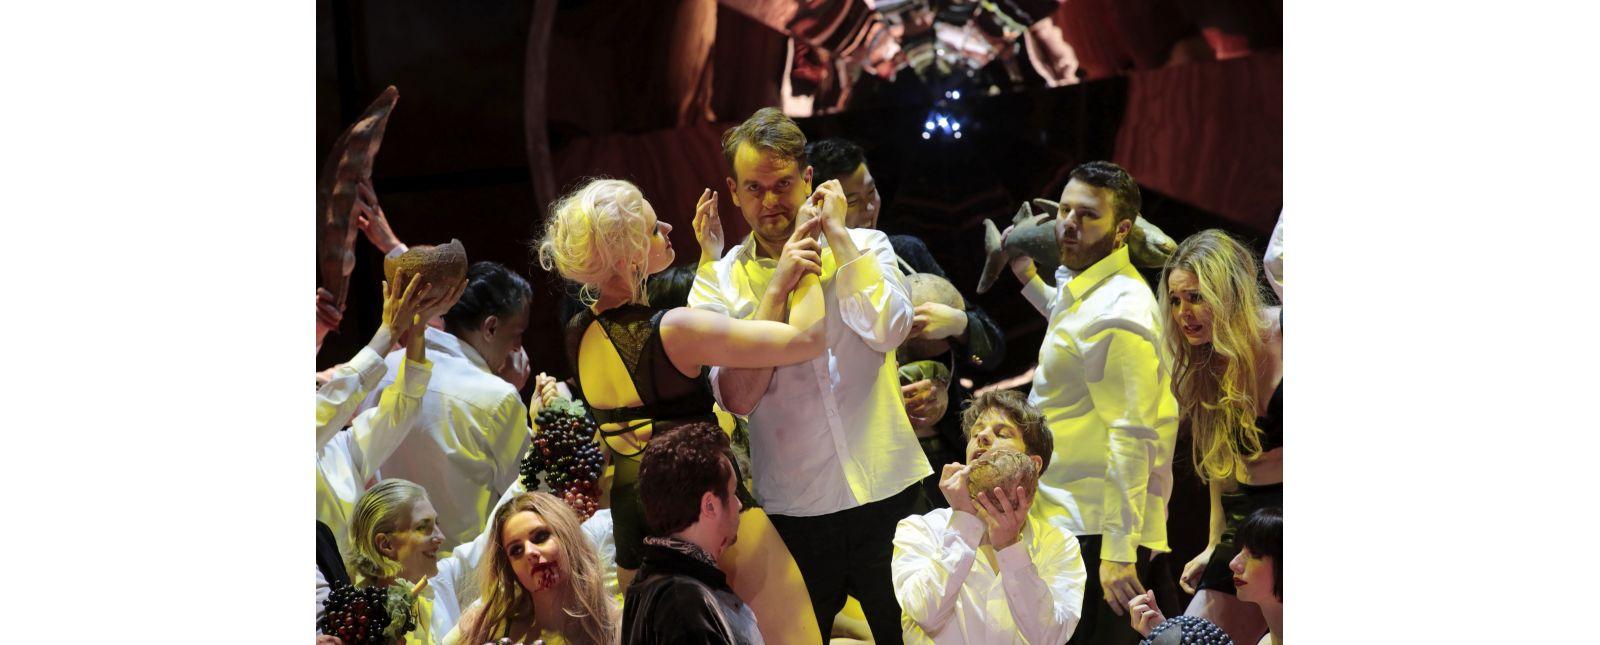 Don Giovanni // Opernchor // Tänzer_innen // Sarah Traubel // Matteo Macchioni // Michael Borth // Jongsoo Yang // Inga Schäfer //  2019 // Foto: Paul Leclaire